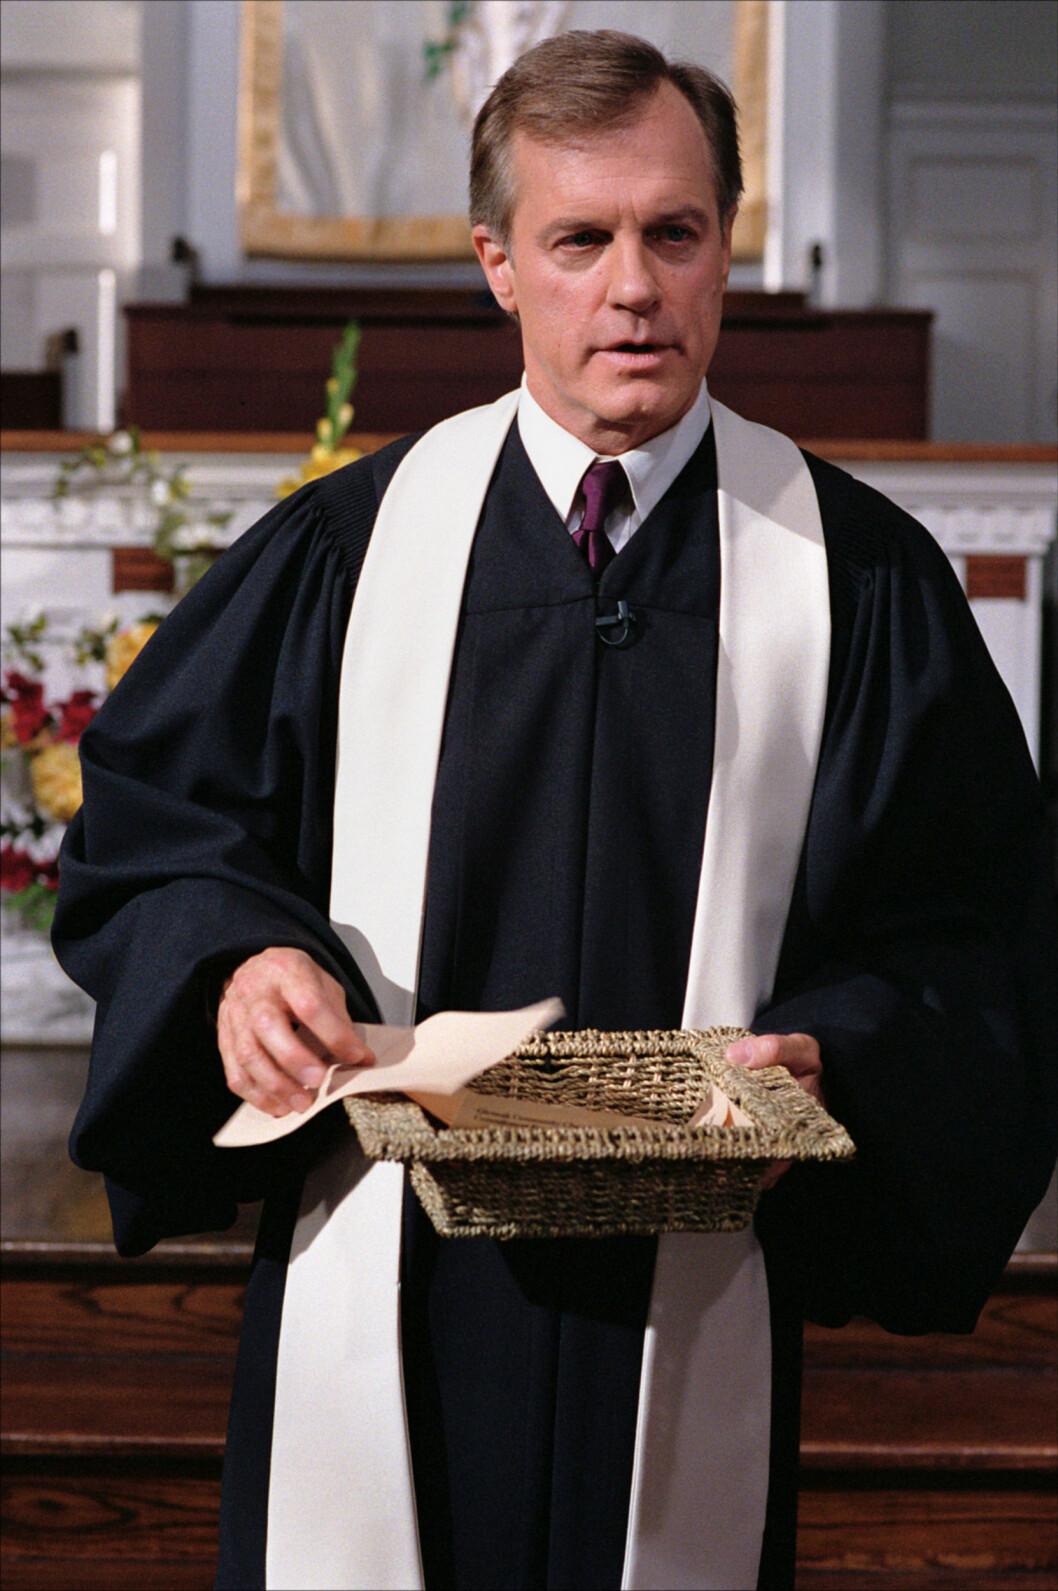 KJENT ROLLE: Collins spilte prest i TV-serien 7th Heaven. Foto: All Over Press